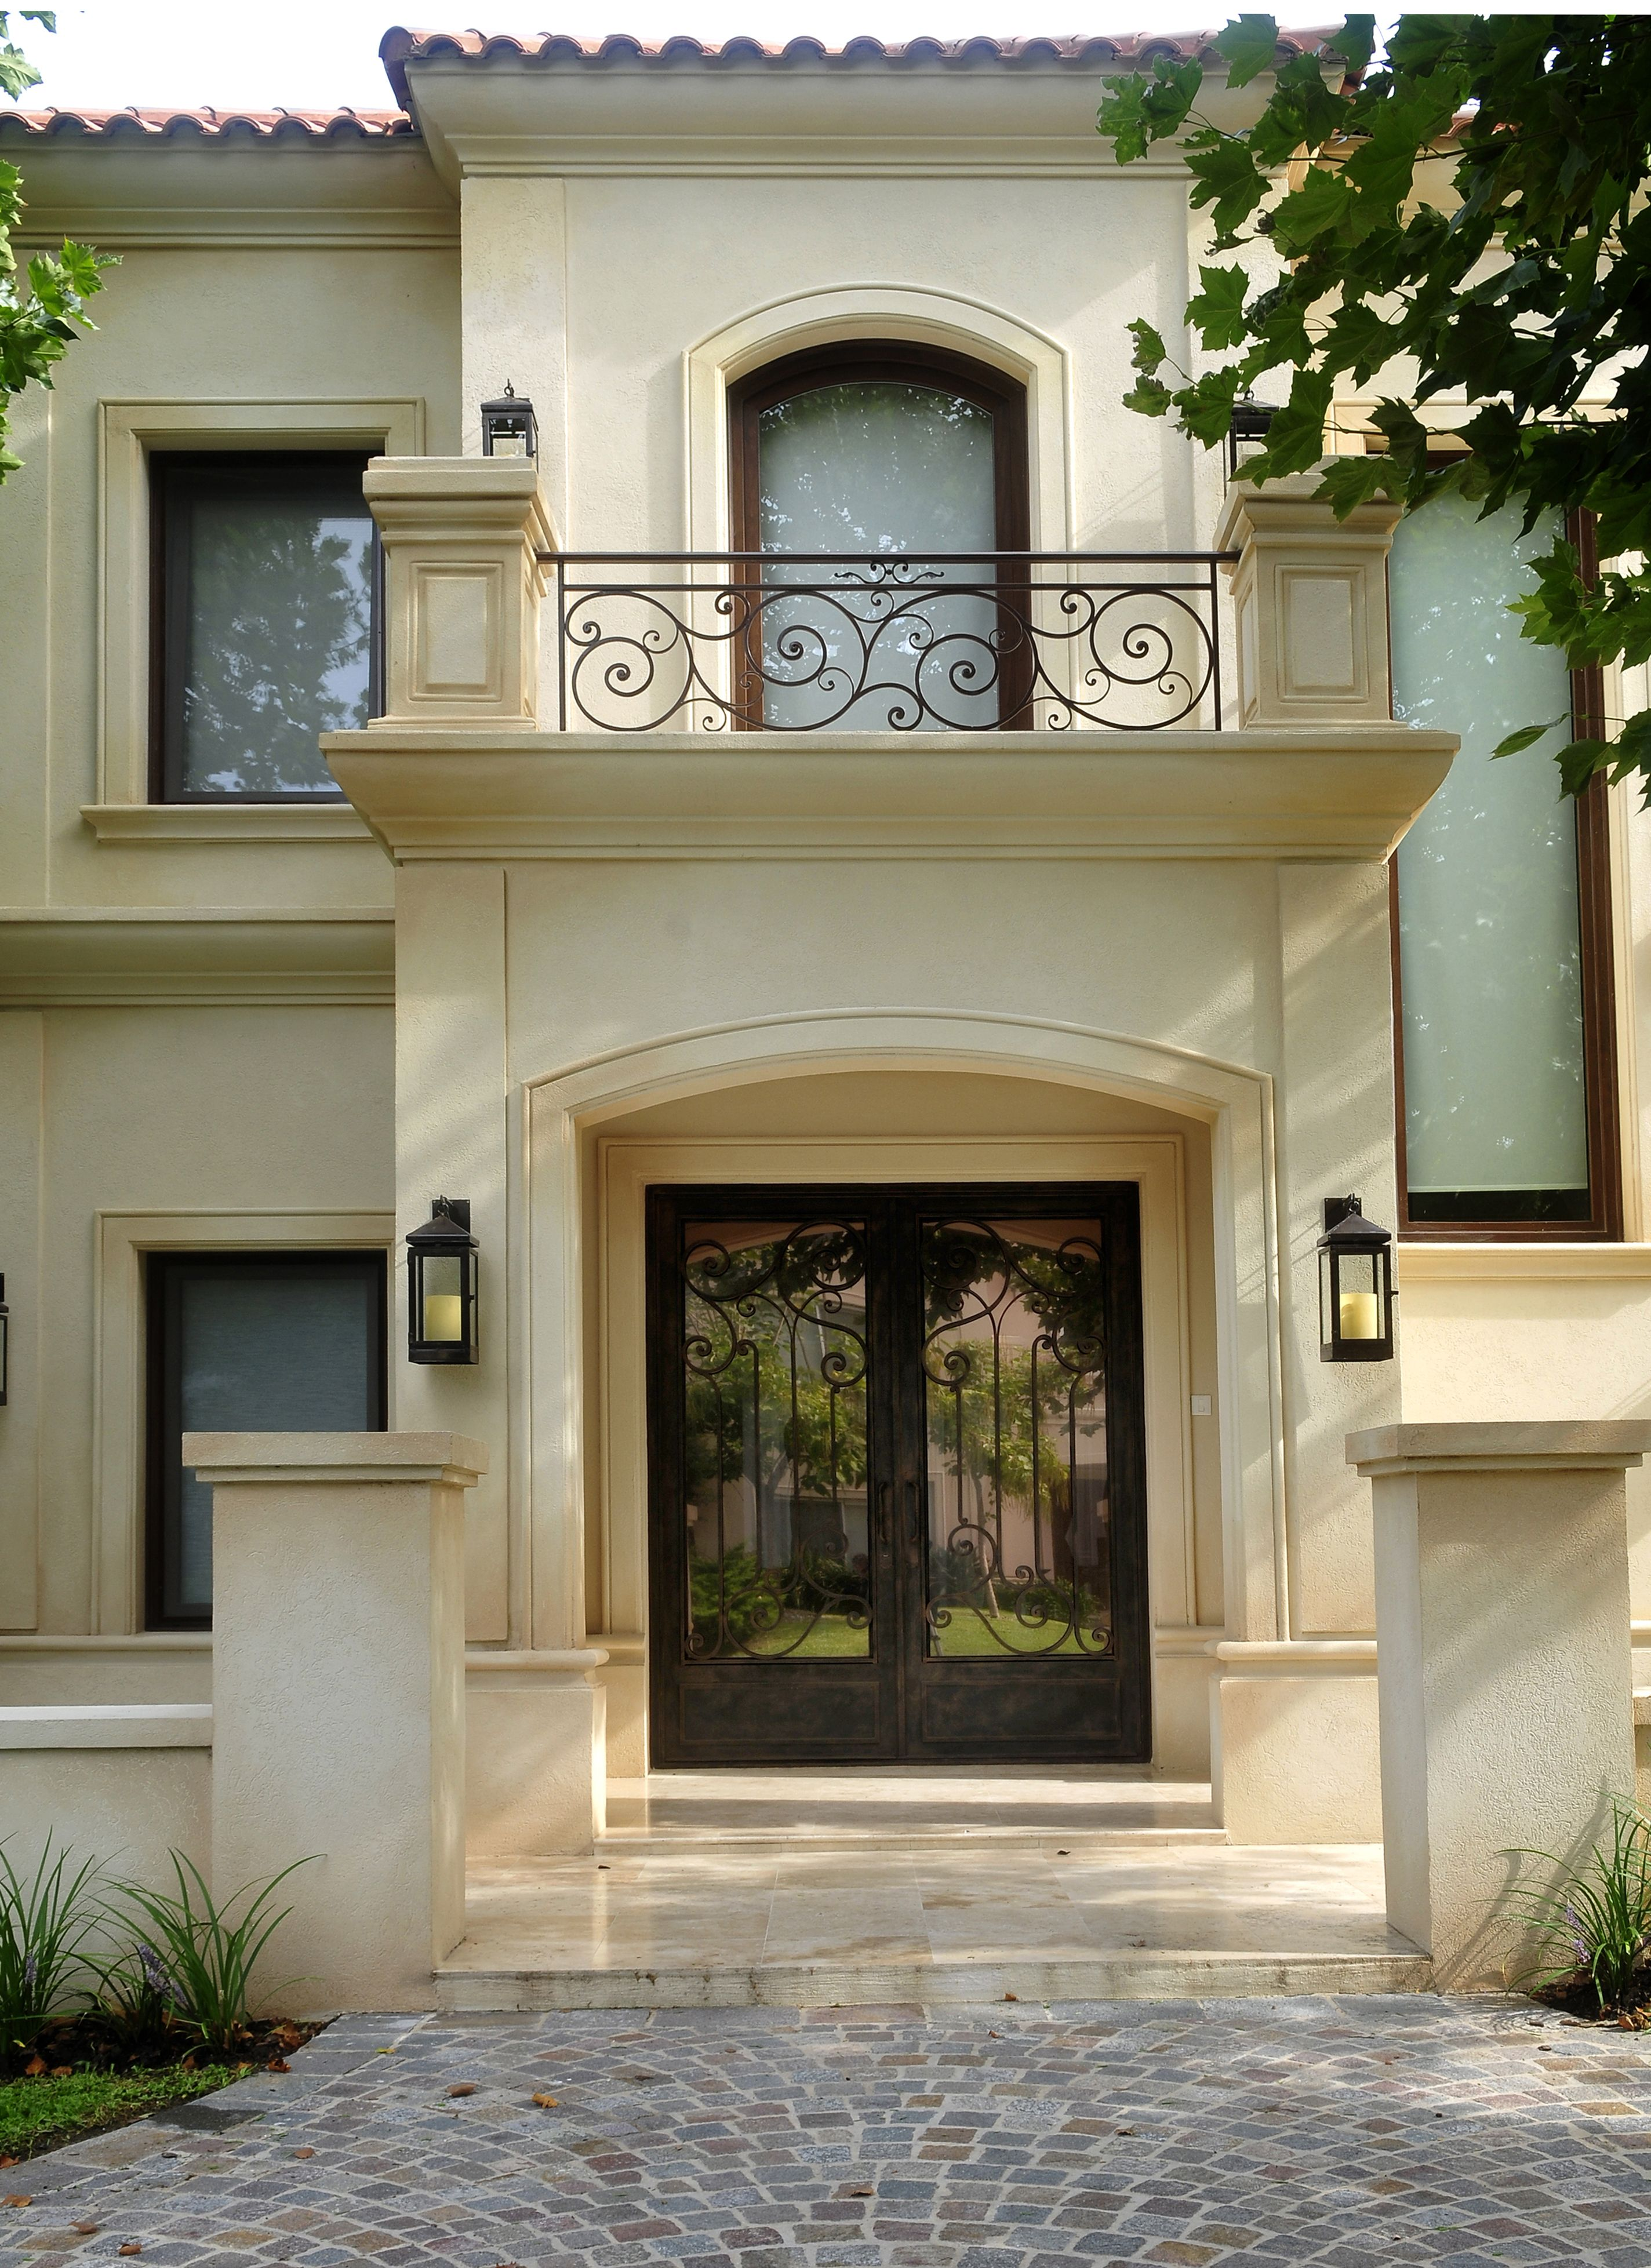 Obra fernandez borda arquitectura puerta de hierro for Puertas hierro exterior